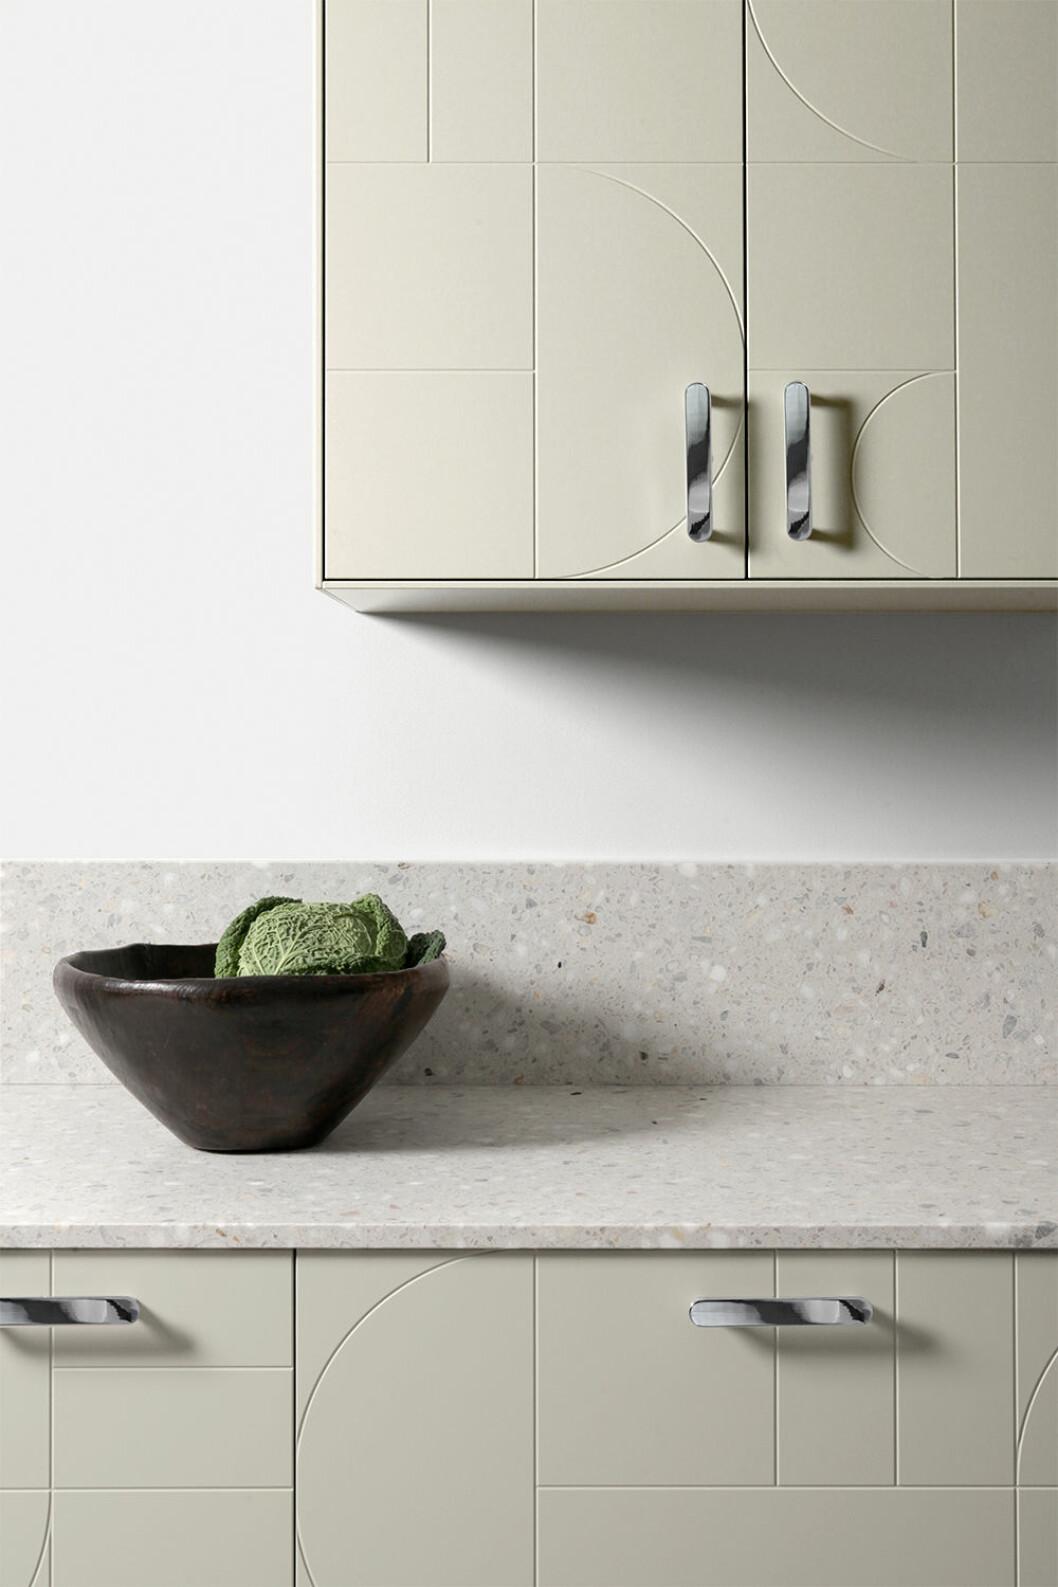 Ikea-kök med Superfronts nya färg Desert Sand